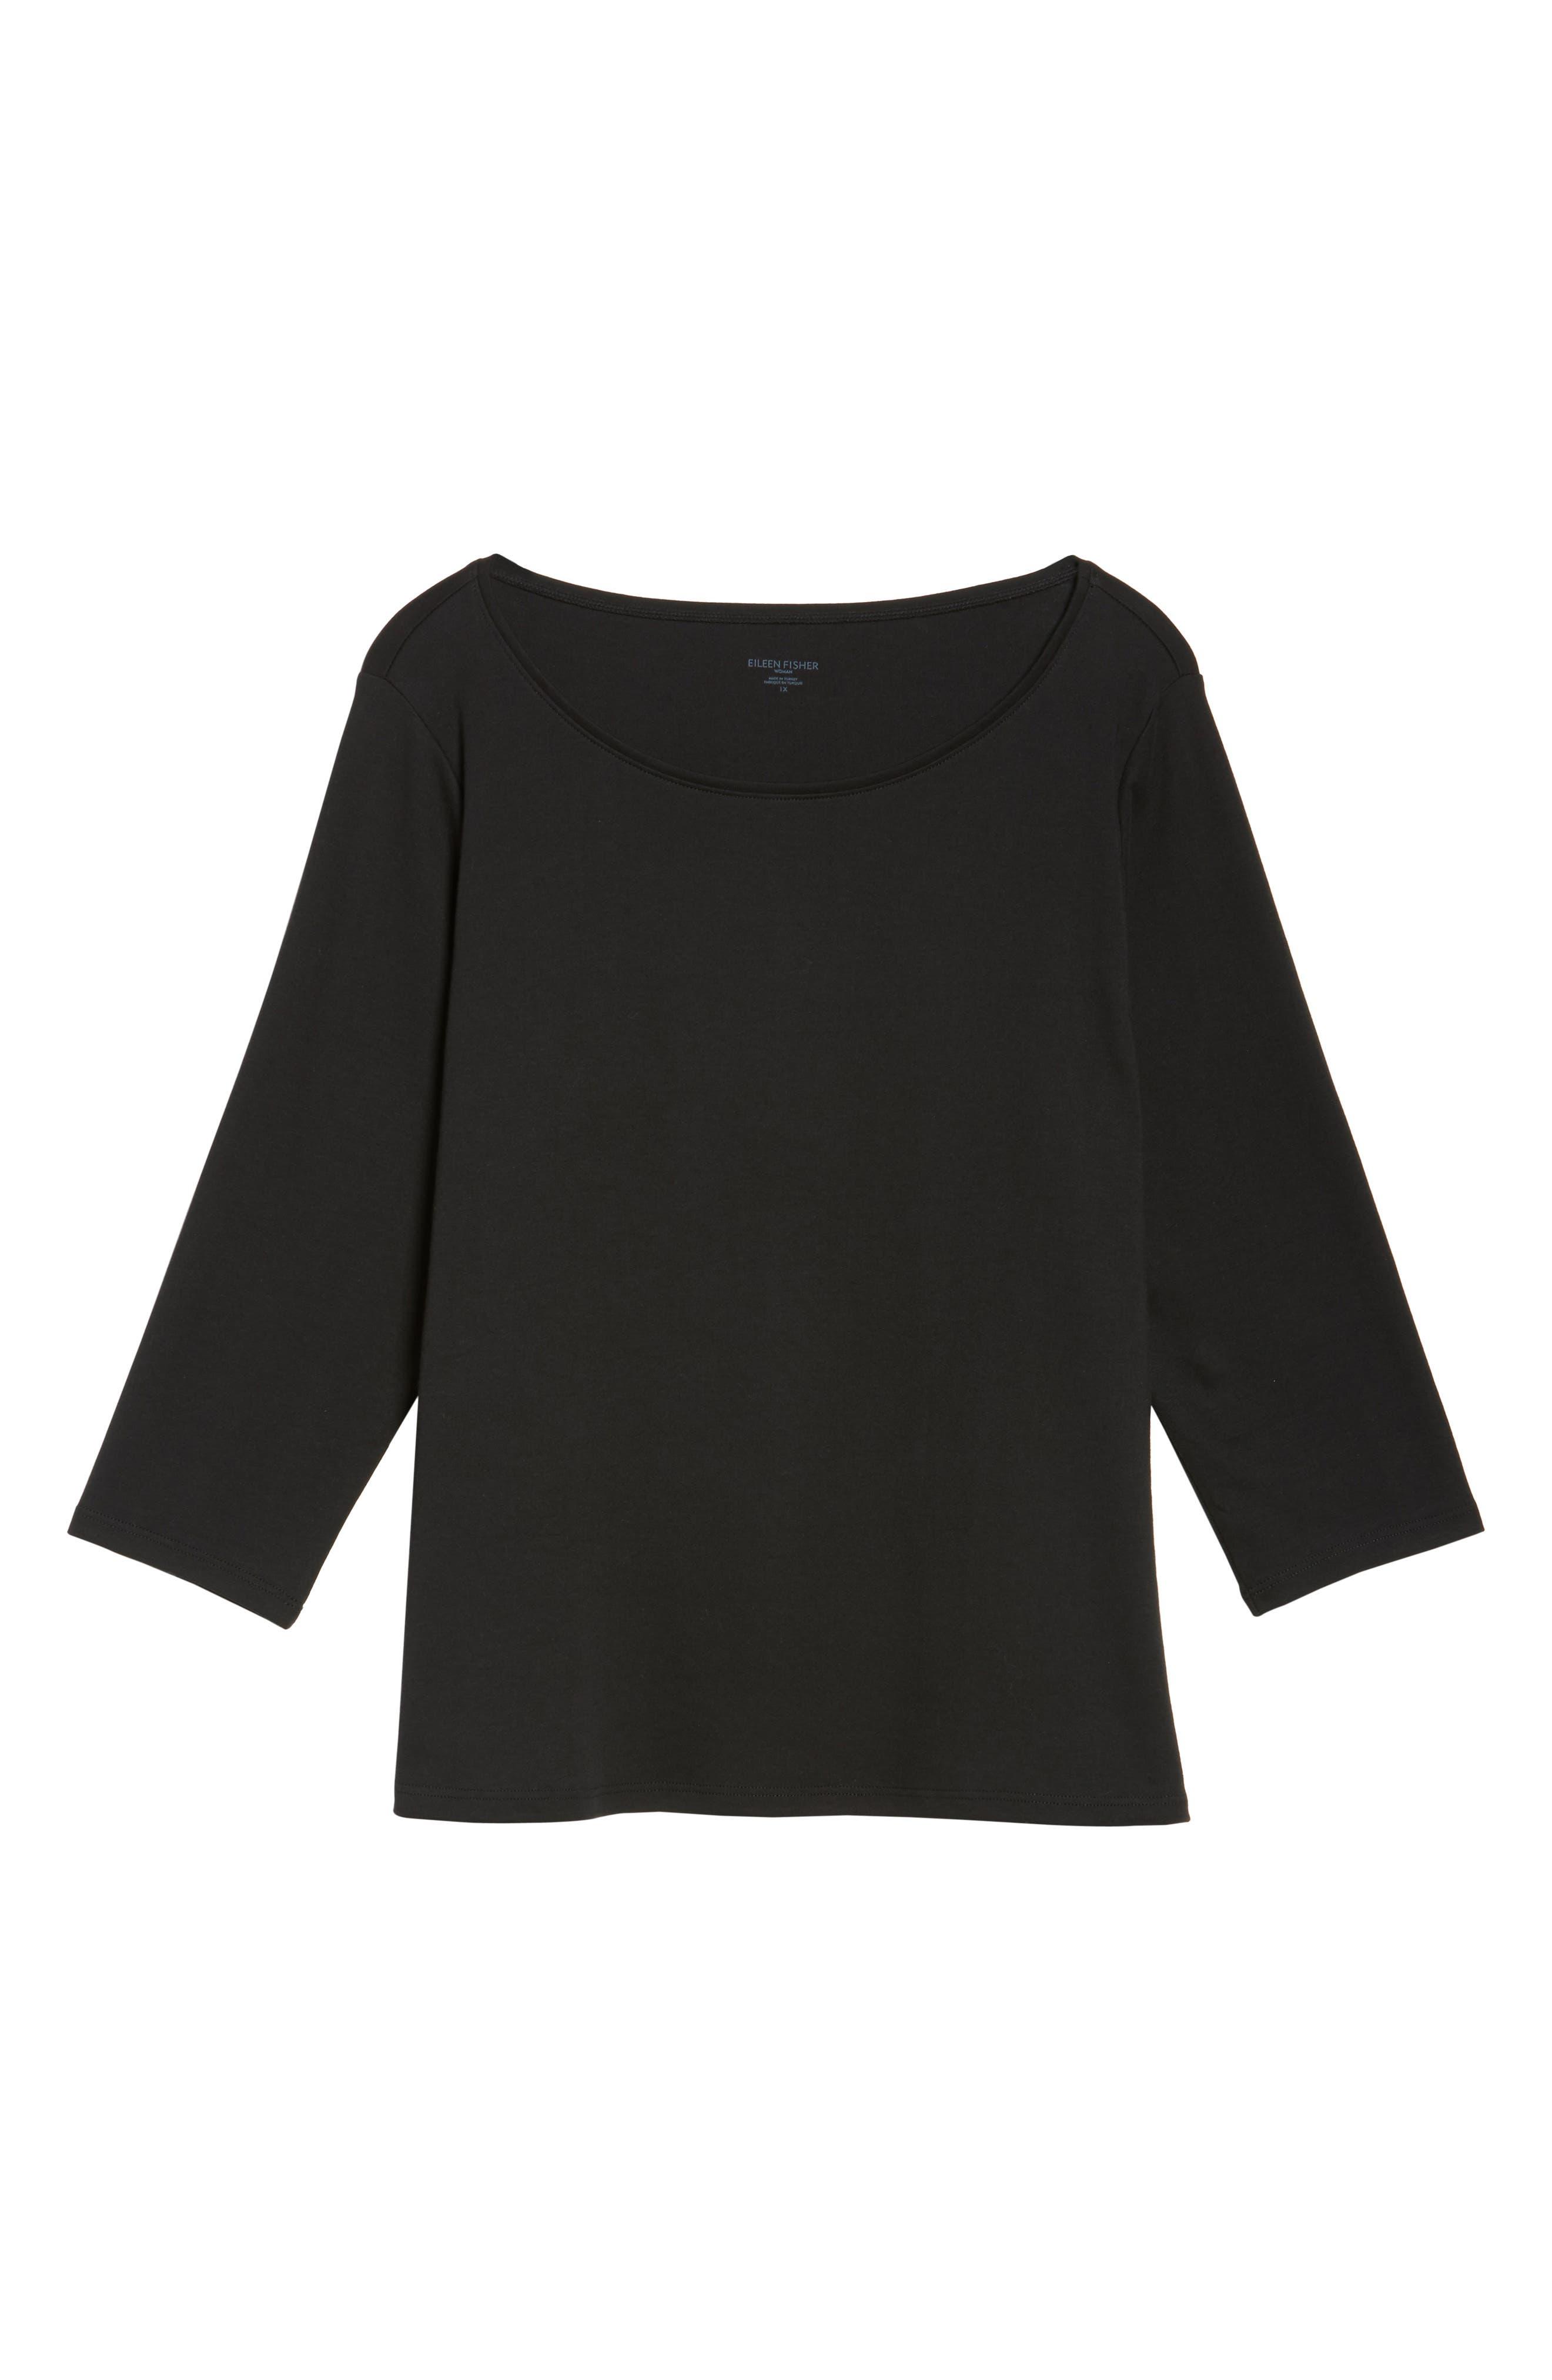 Organic Cotton Ballet Neck Top,                             Alternate thumbnail 6, color,                             Black